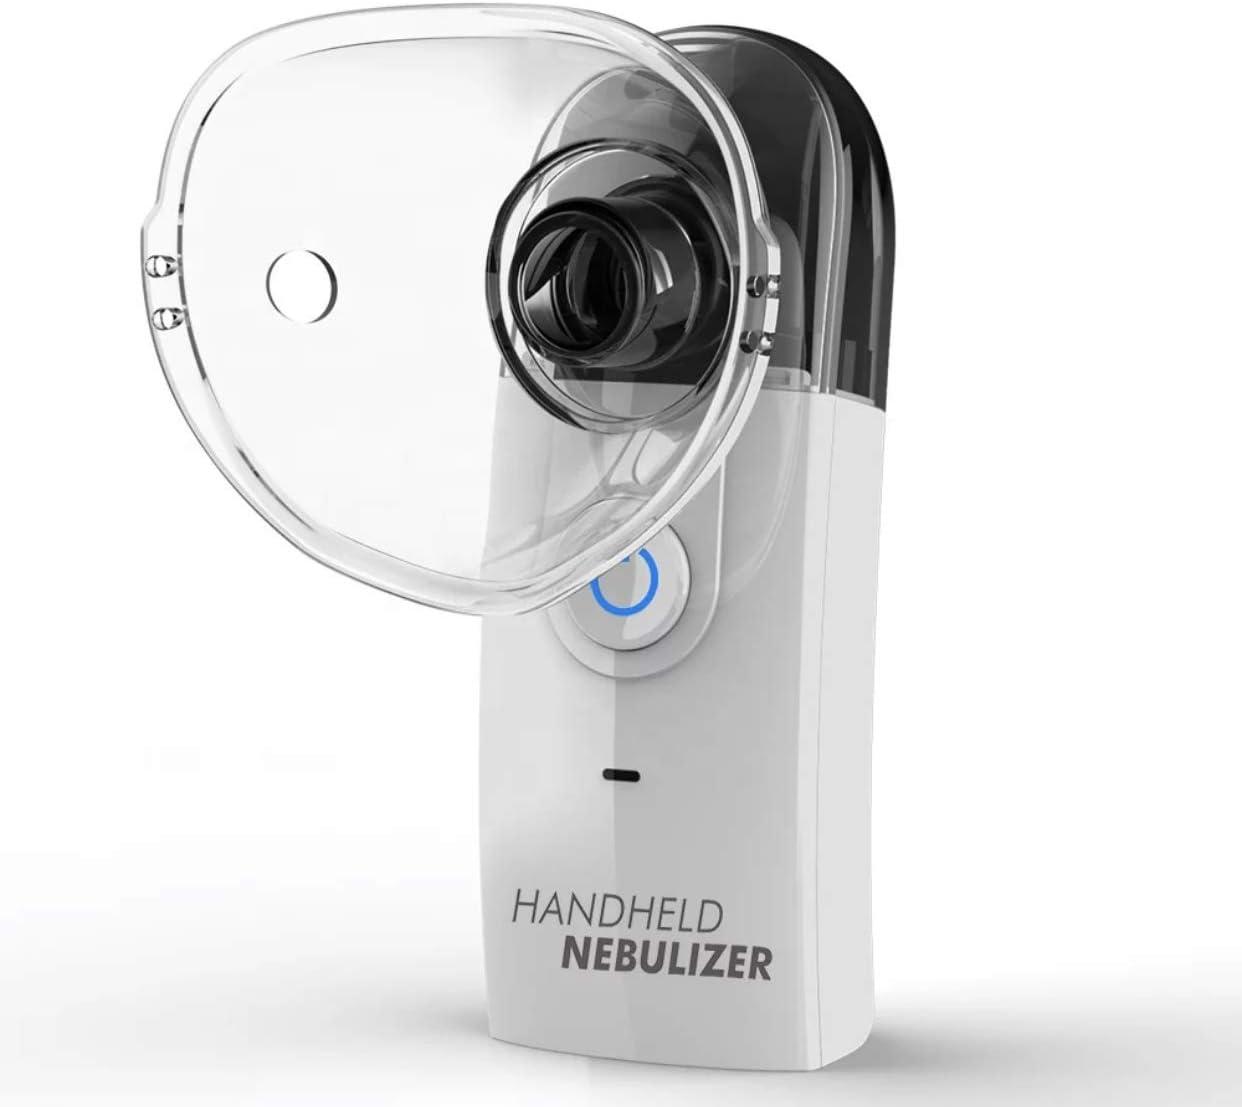 BART Mini Handheld Portable Nebulizer, Sealed Internal Rechargeable Battery, Inhaler, Nebulizer, Vaporizer, Mesh Ultrasonic Atomizer Machine, Compact Humidifier for Kids & Adults, Home & Travel Use